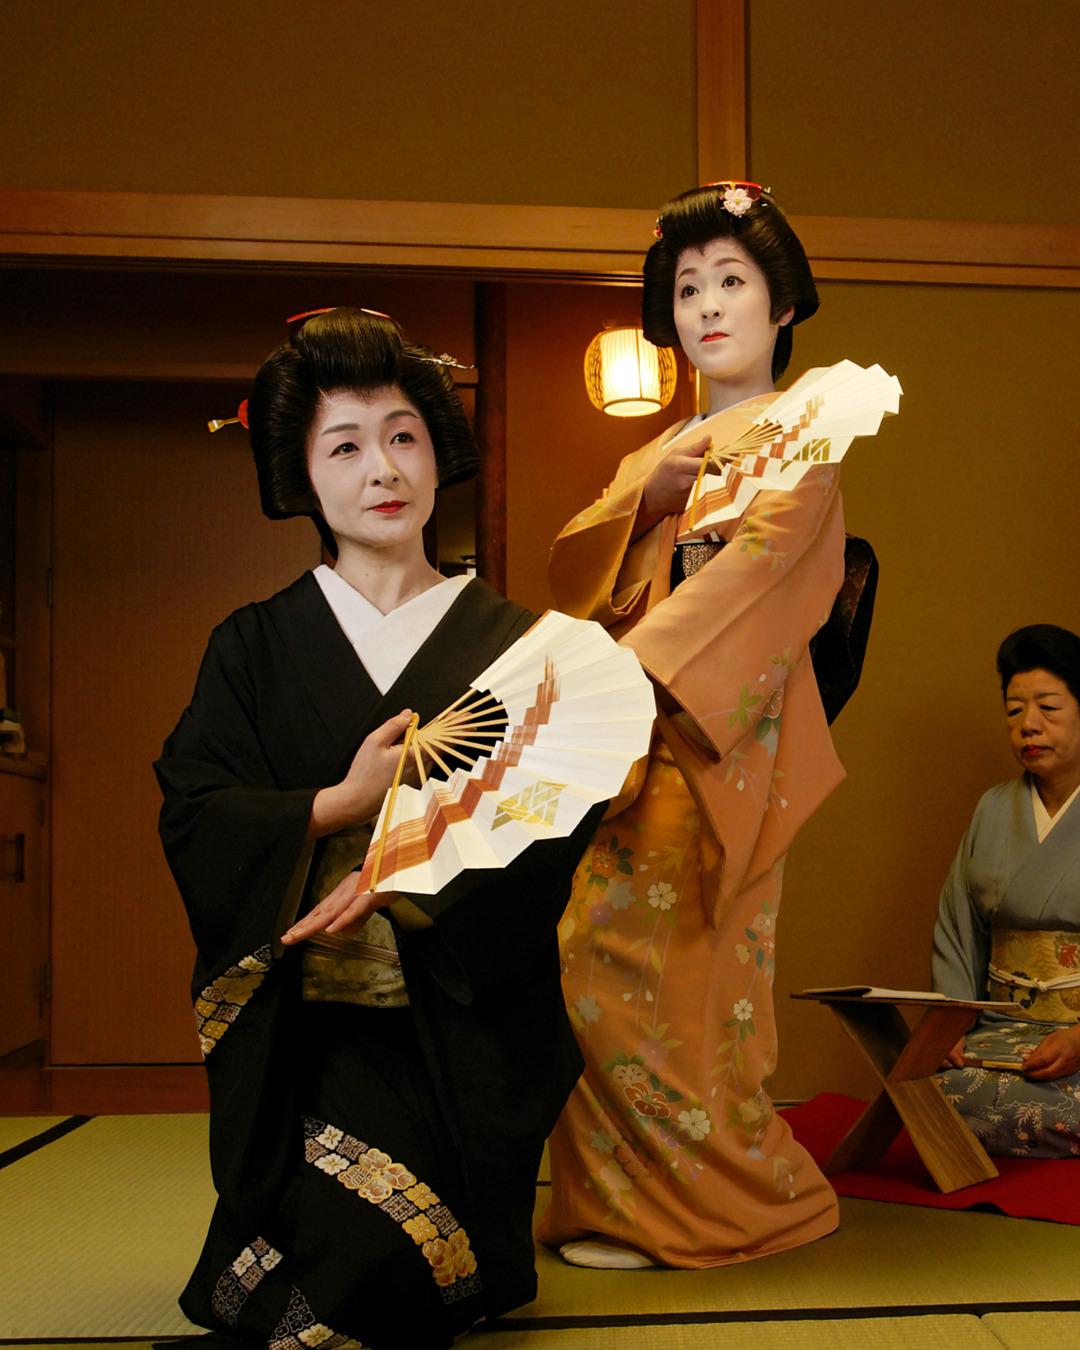 Dancing geiko (geisha) of Kanazawa's Nishi Chaya District